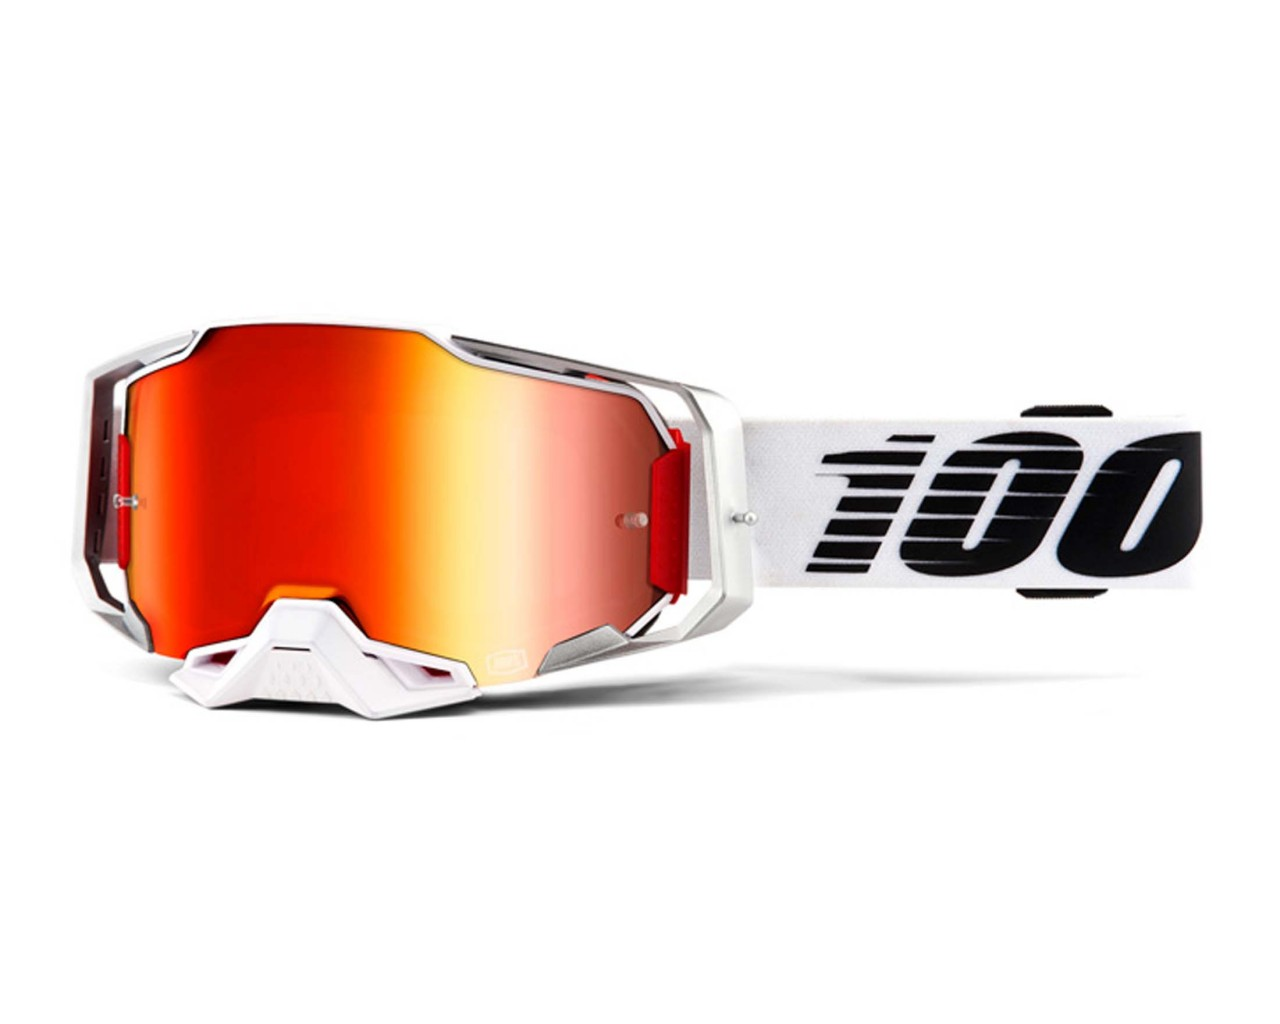 100% Armega Goggle - Anti fog mirror lens | Lightsaber